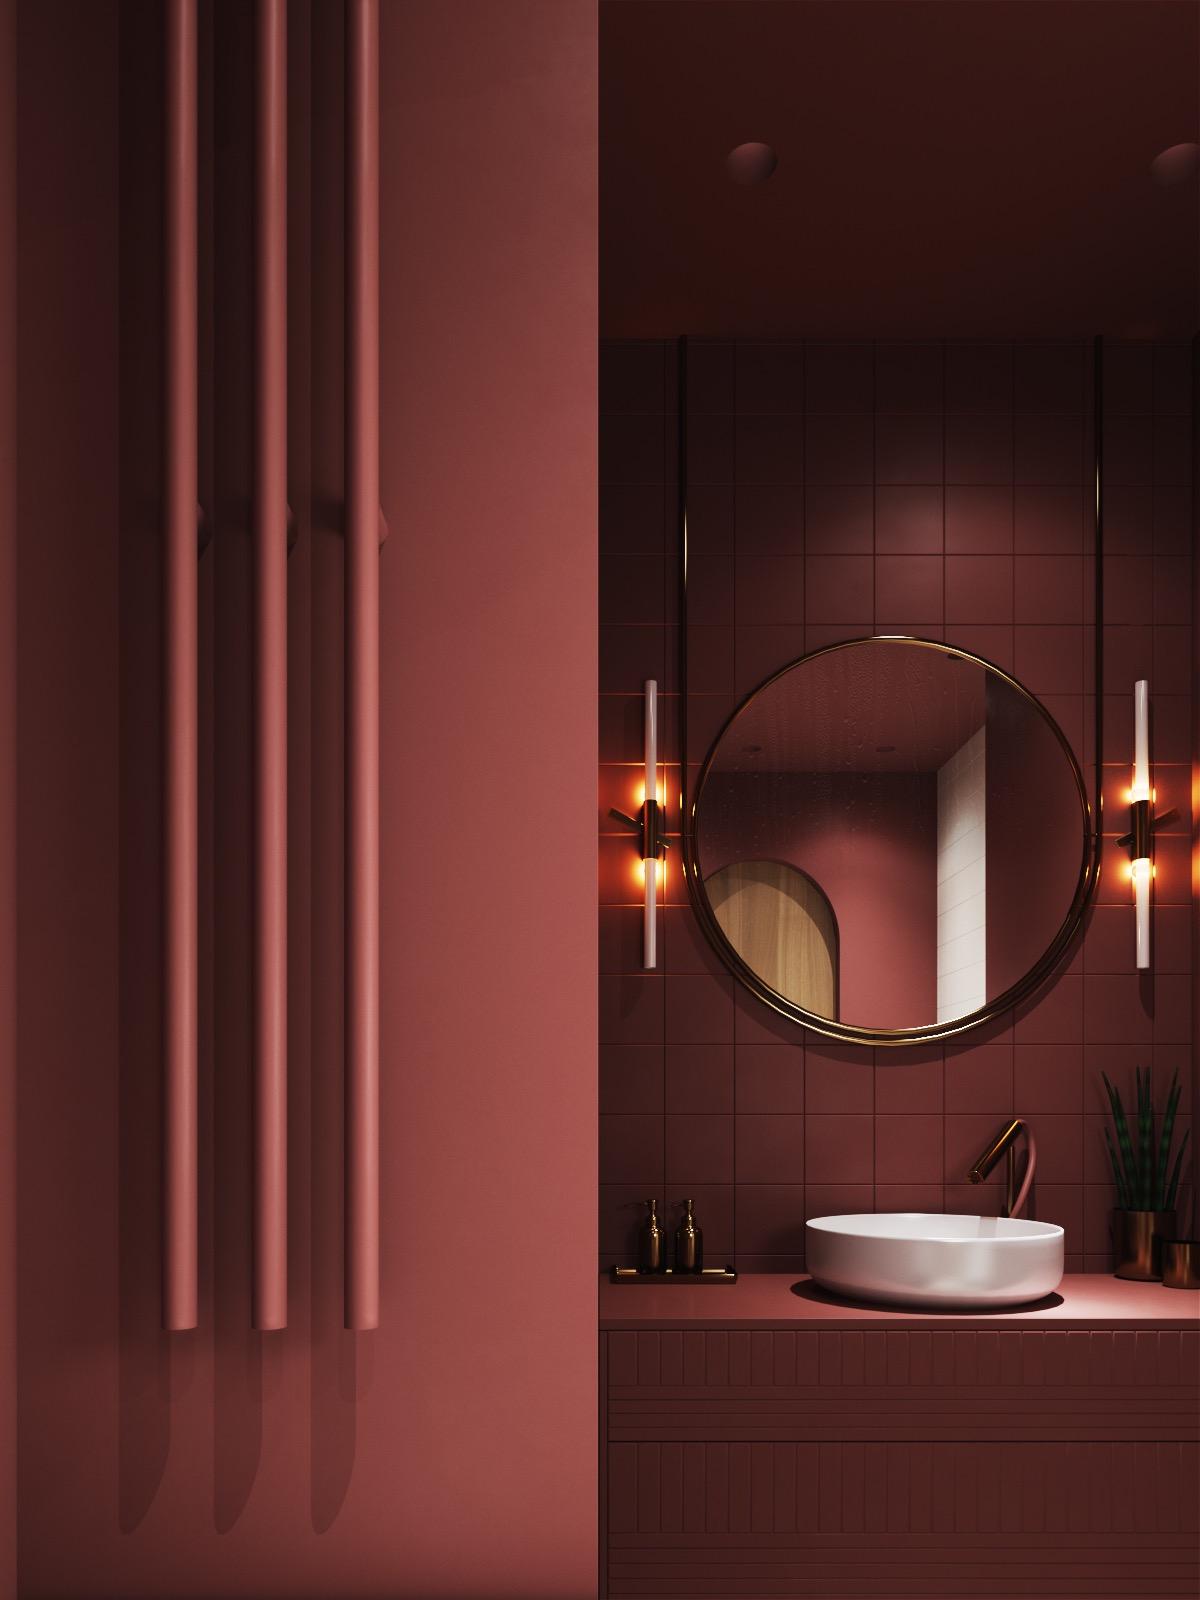 Excellent burgundy colored bathroom